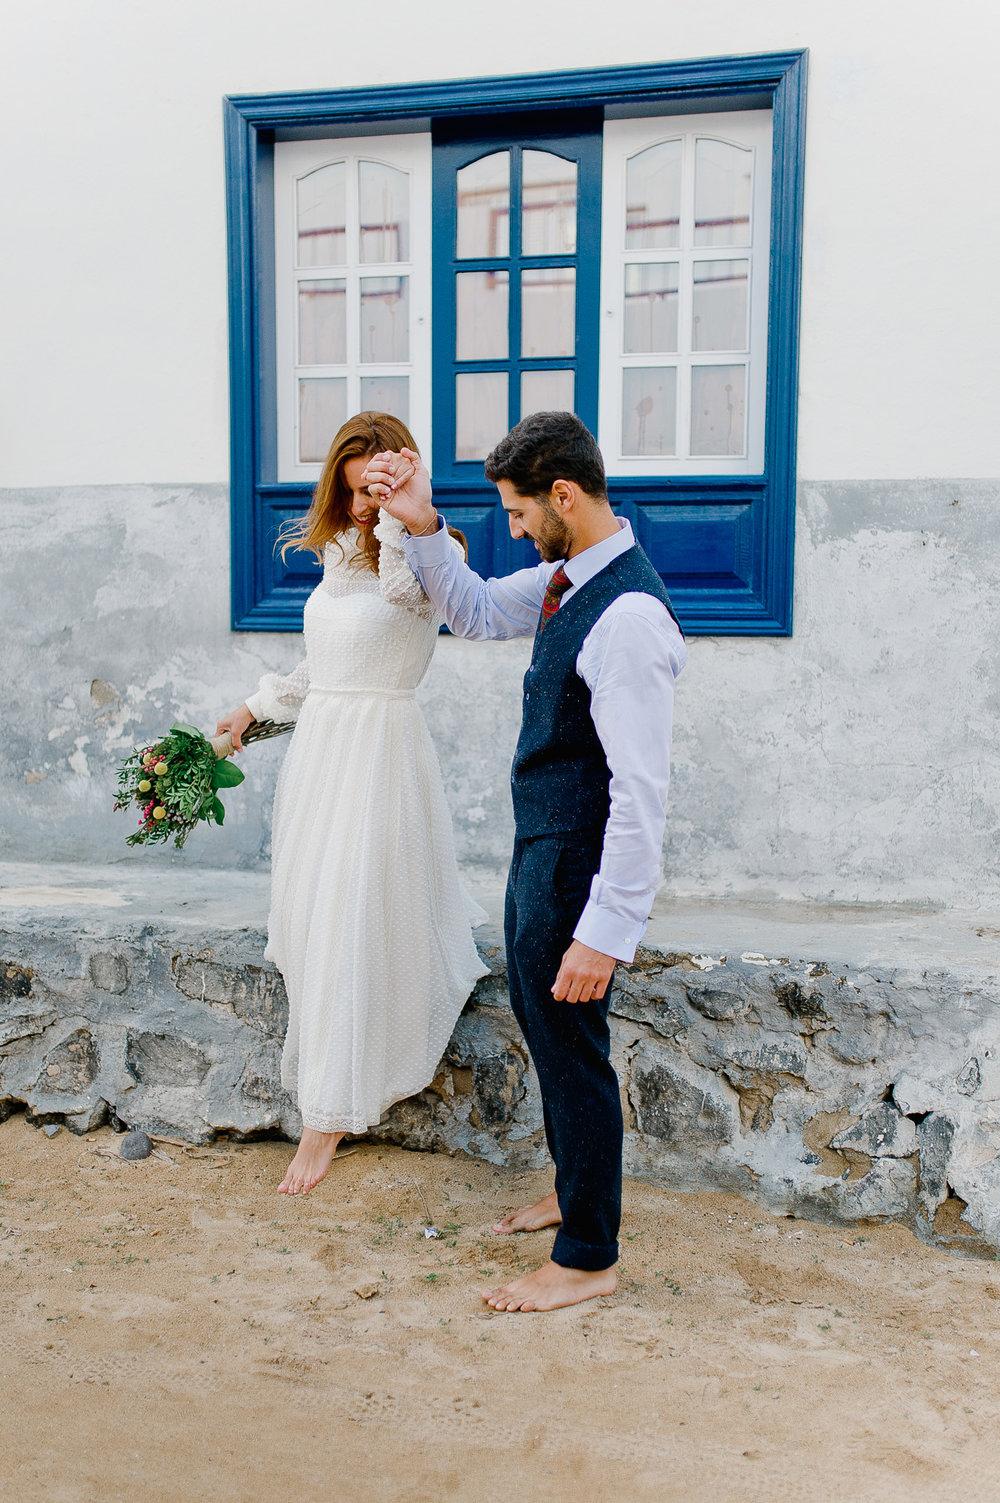 anna hari wedding photography-14.jpg